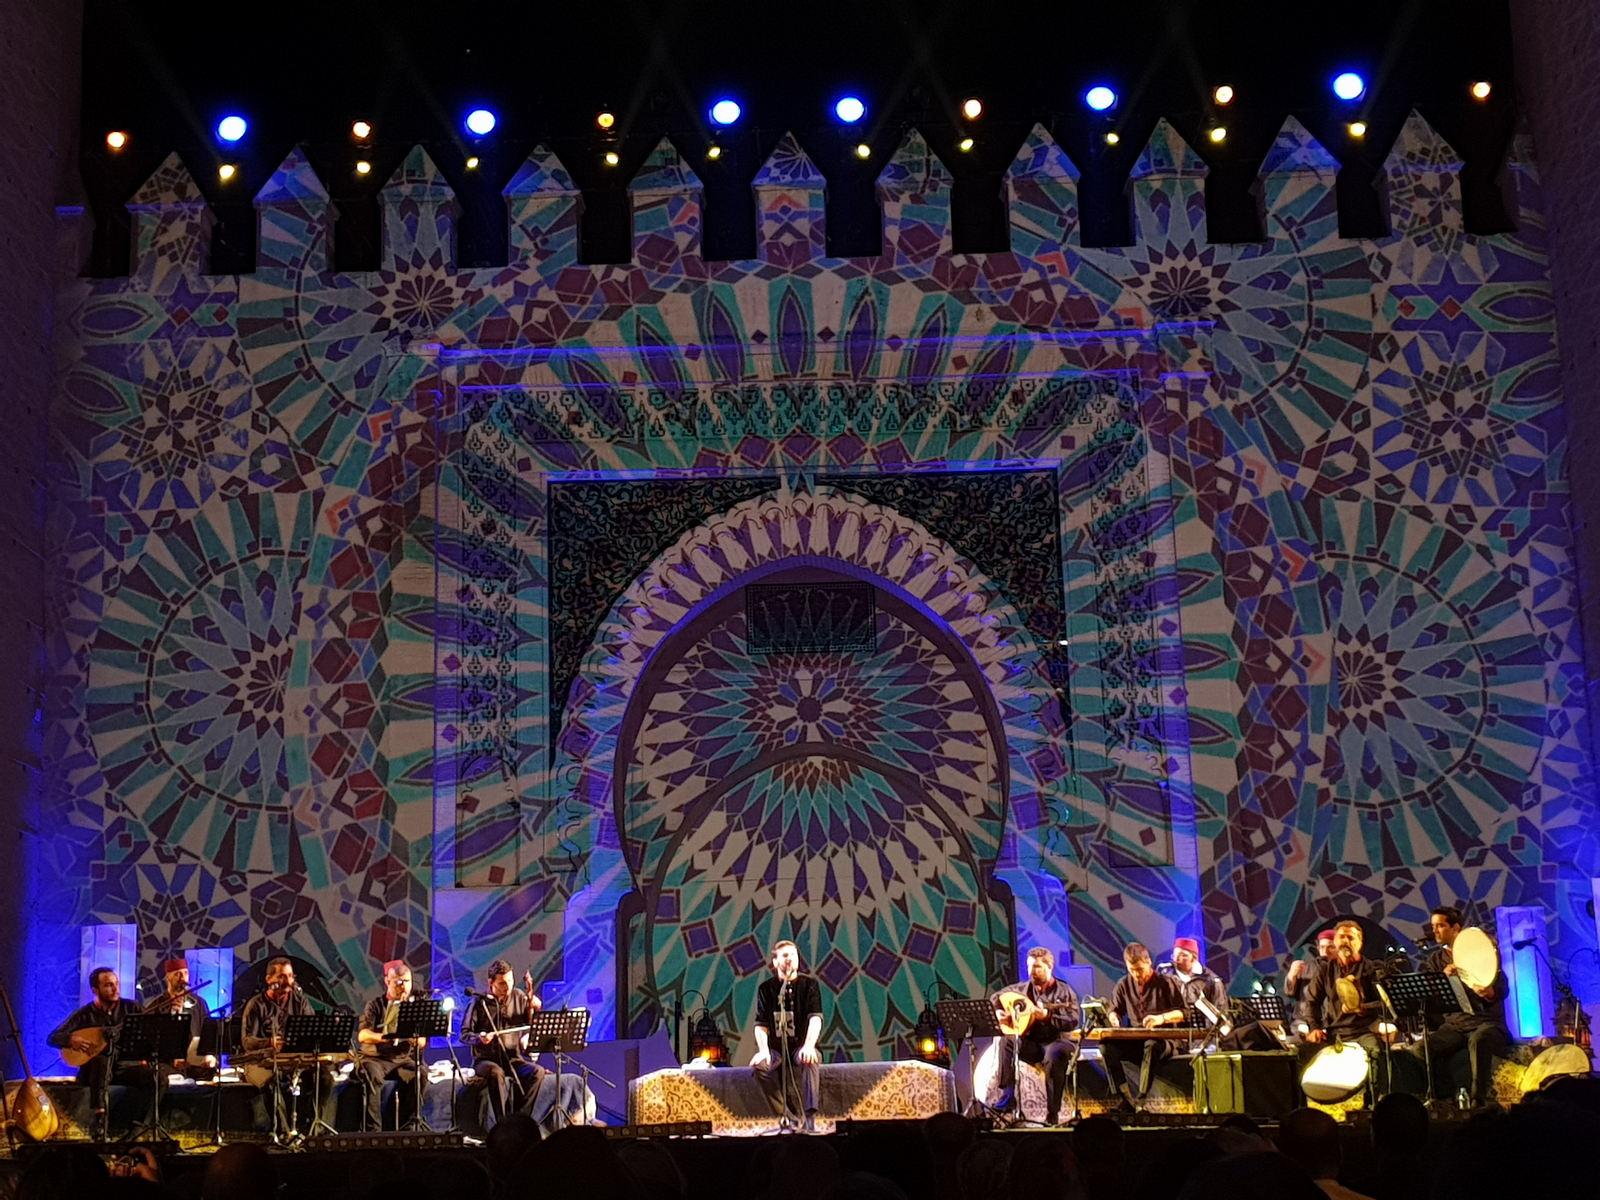 Festival de Fez de Música Sagrada • Marrocos